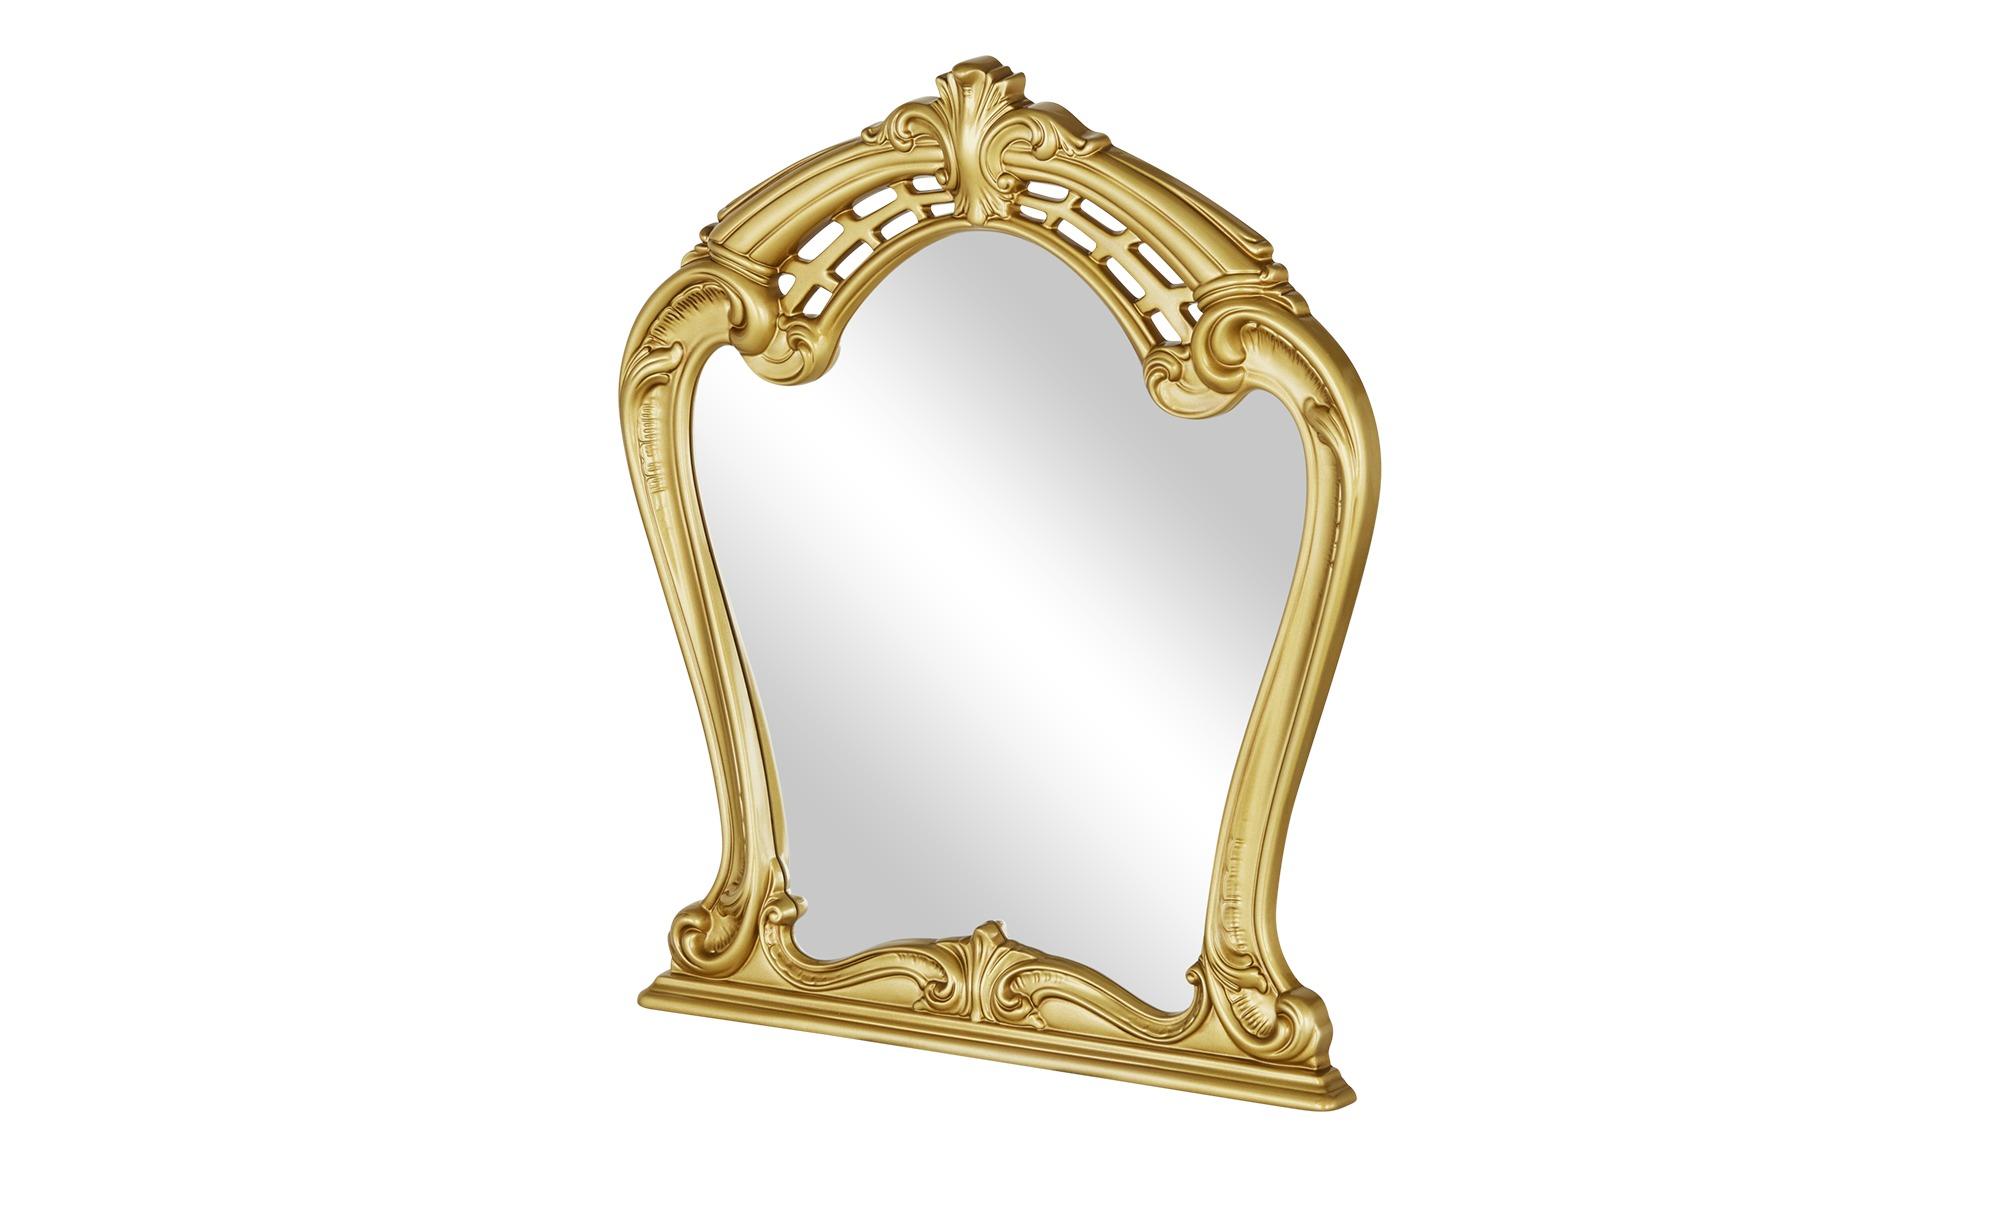 Goldfarbener Barockspiegel